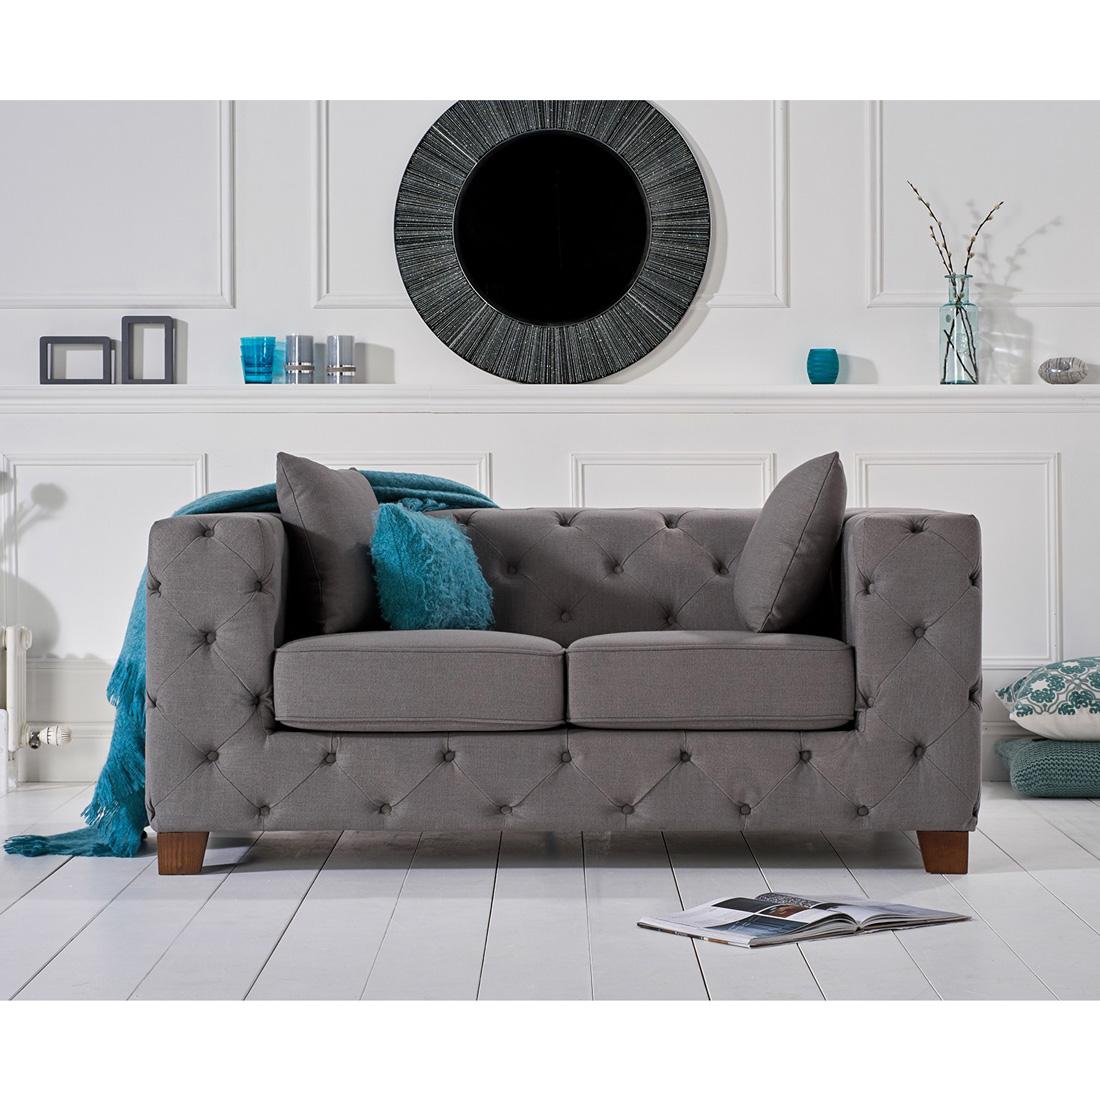 Fordham-dark-grey-fabric-two-seater-lifestyle-shot